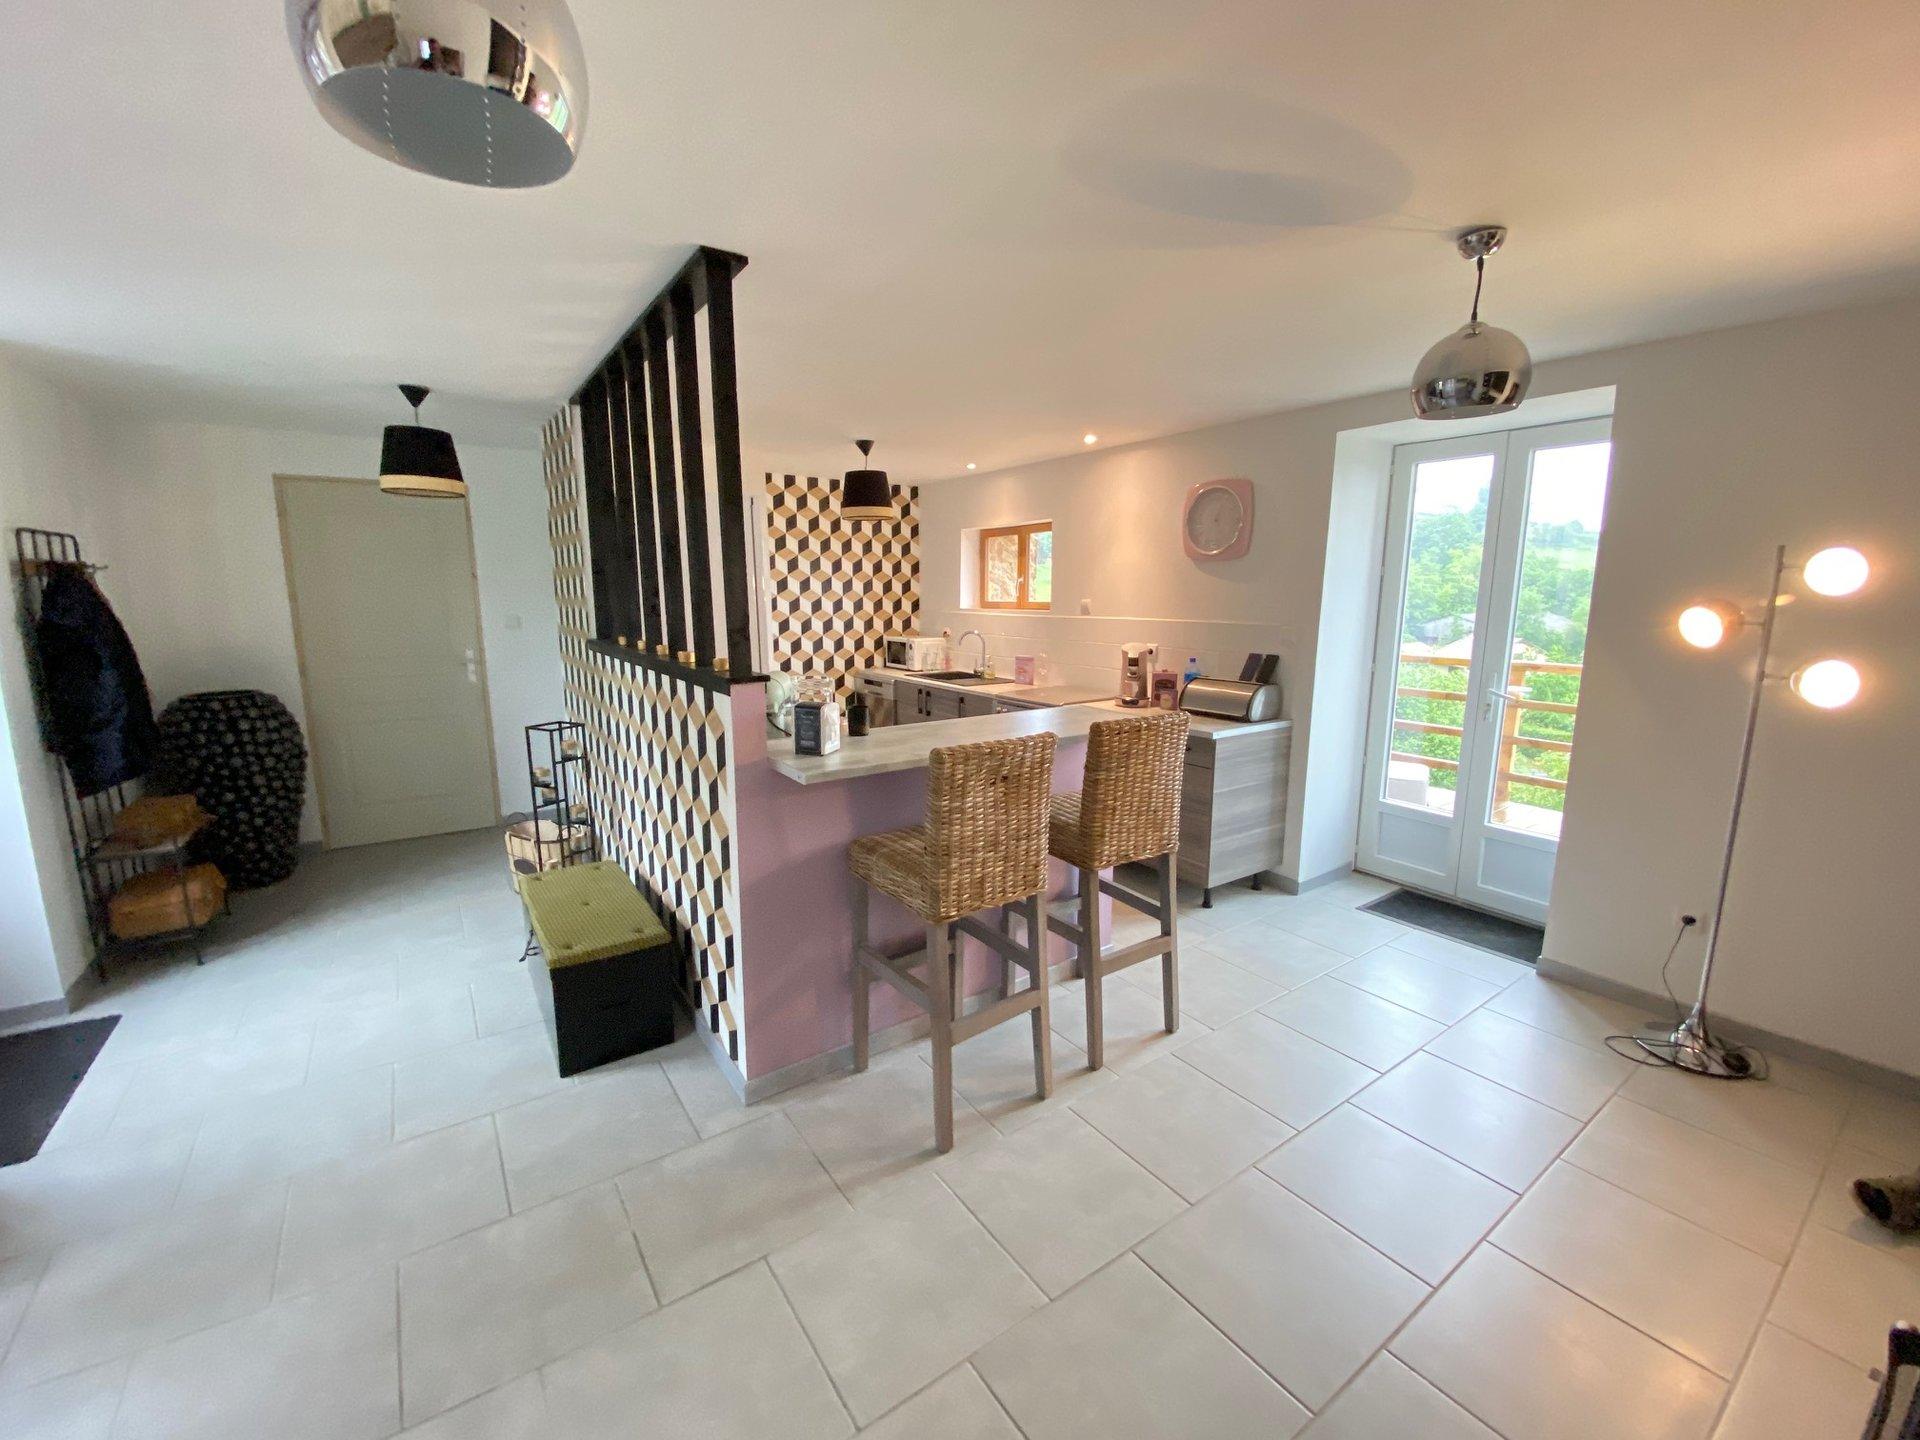 Verkauf Haus - Saint-Christophe